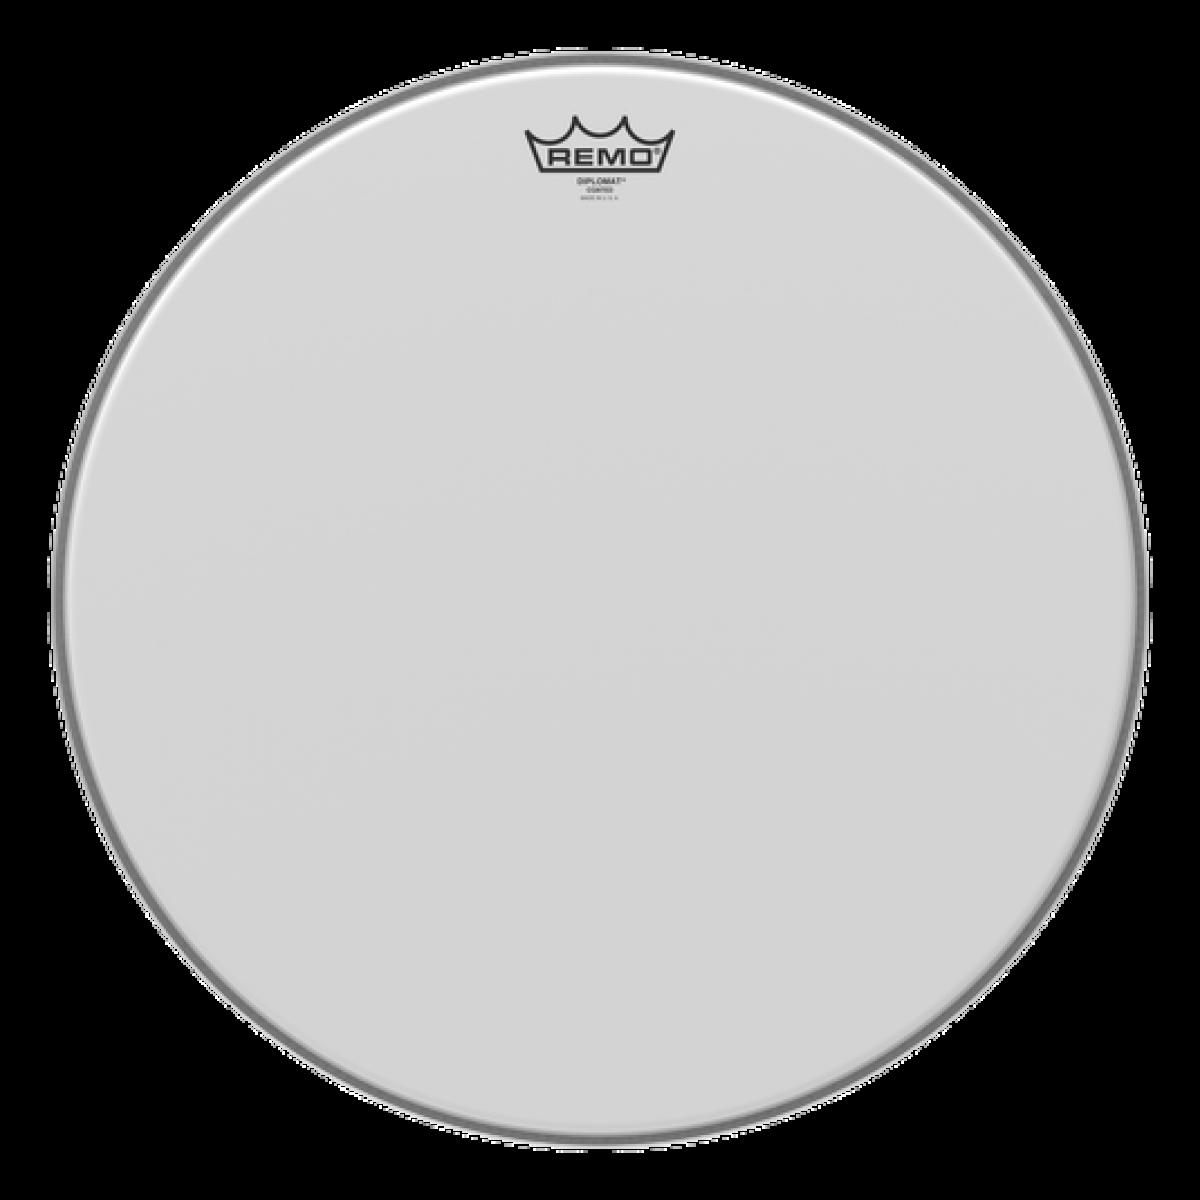 "Remo Drum Skin Diplomat Coated 18"" inch ( BD-0118-00 )"